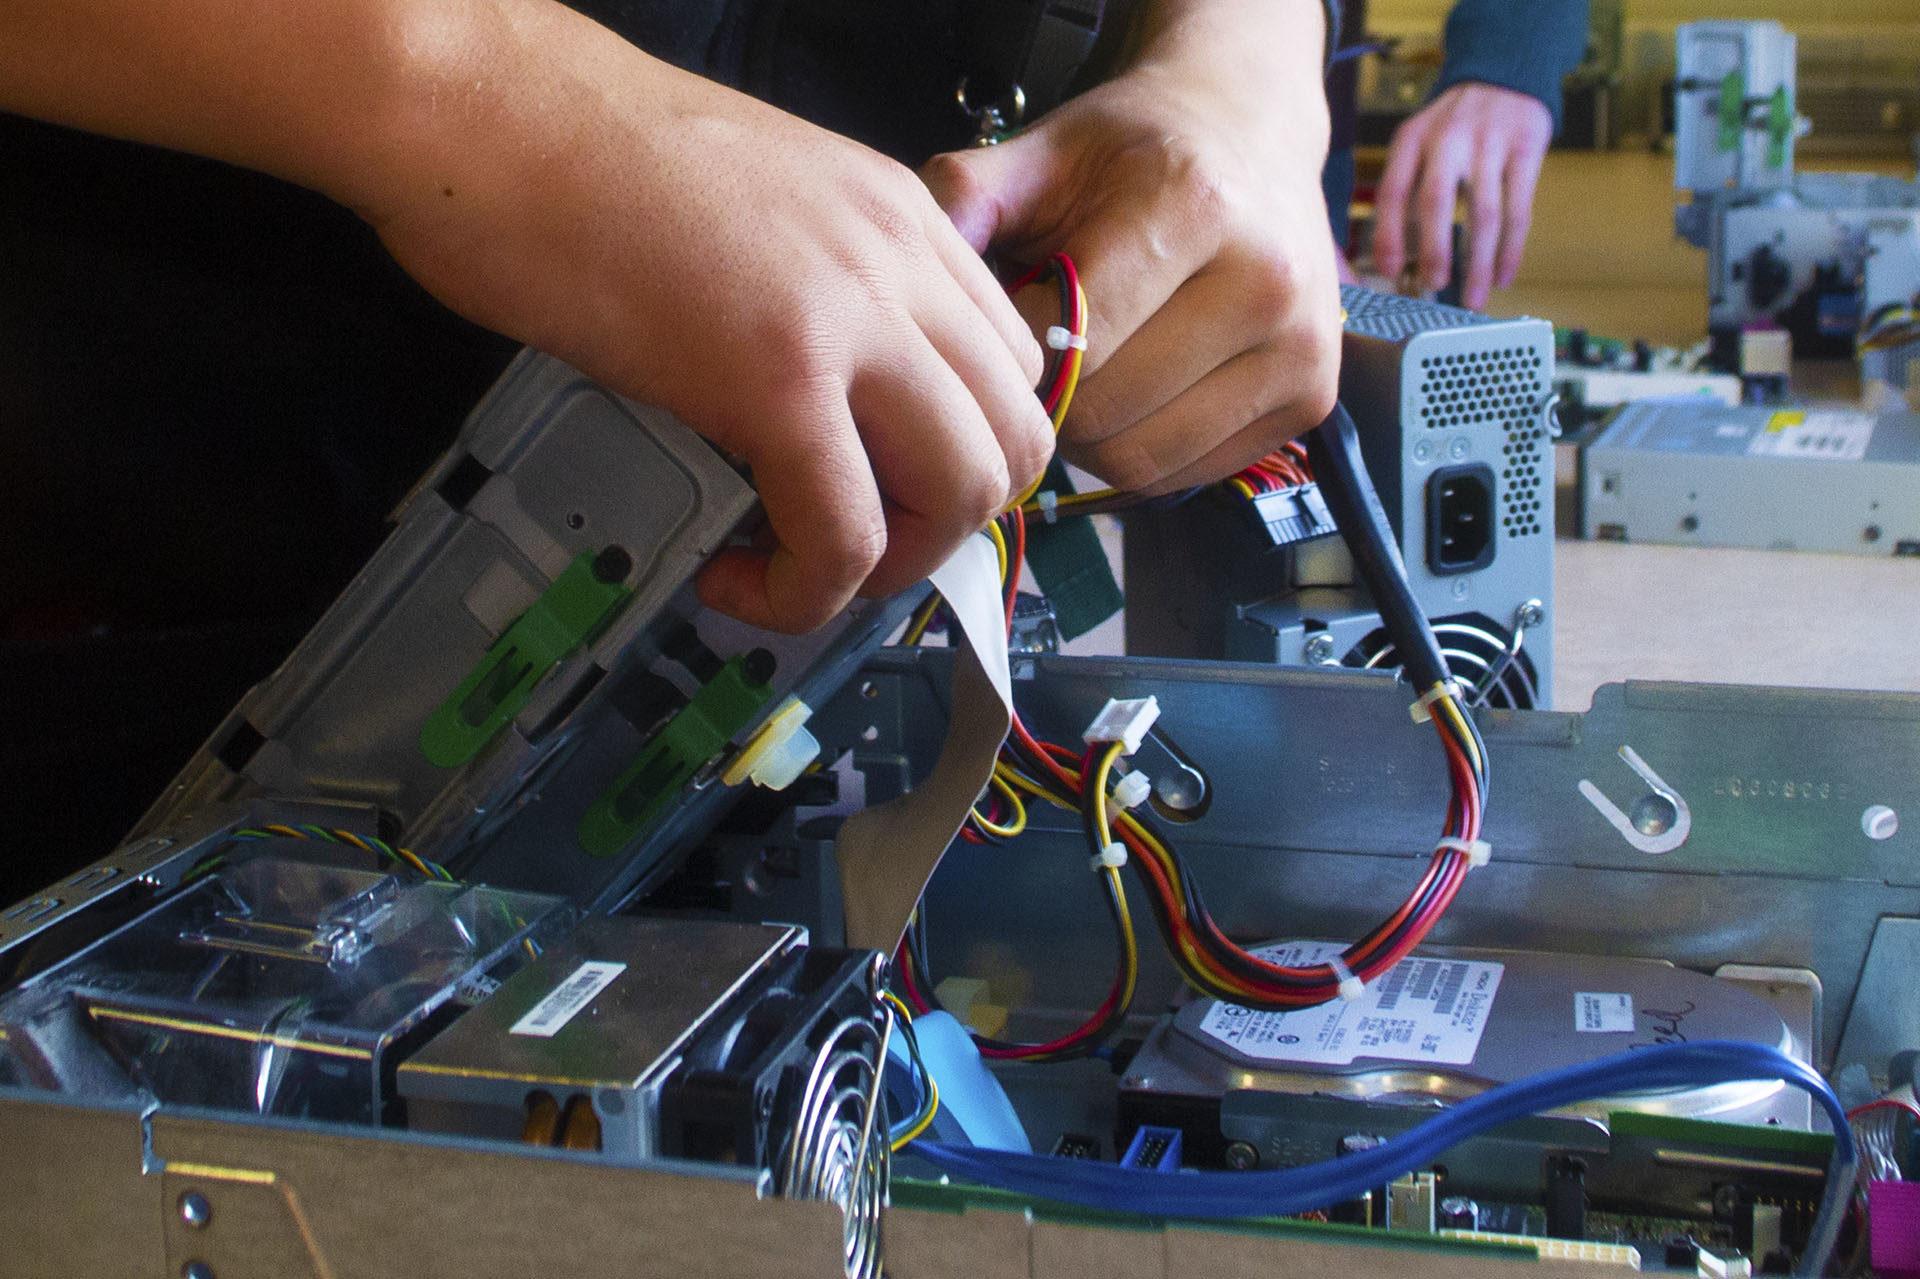 Computing. Students assembling computer hardware